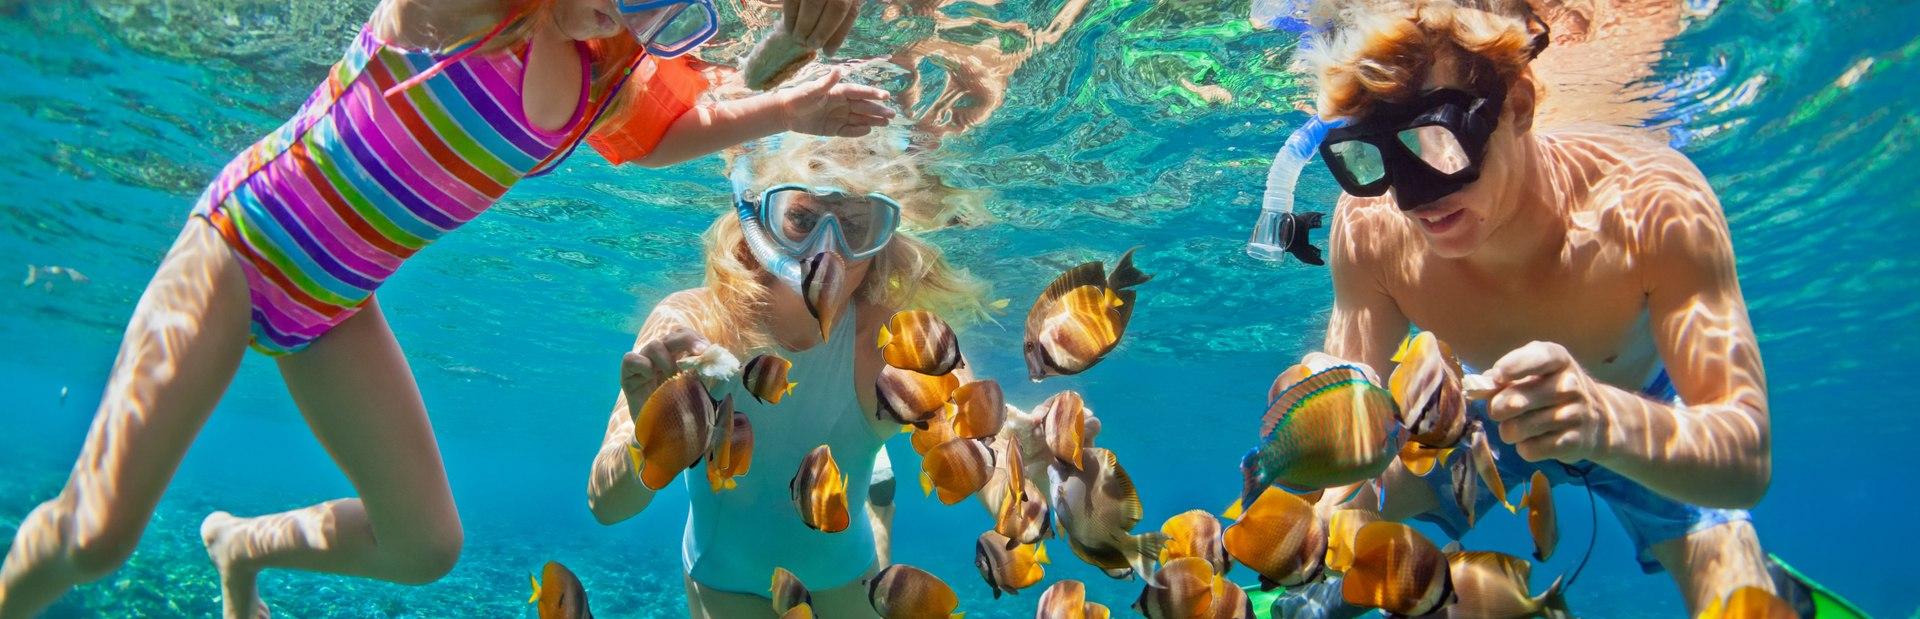 Bahamas inspiration and tips